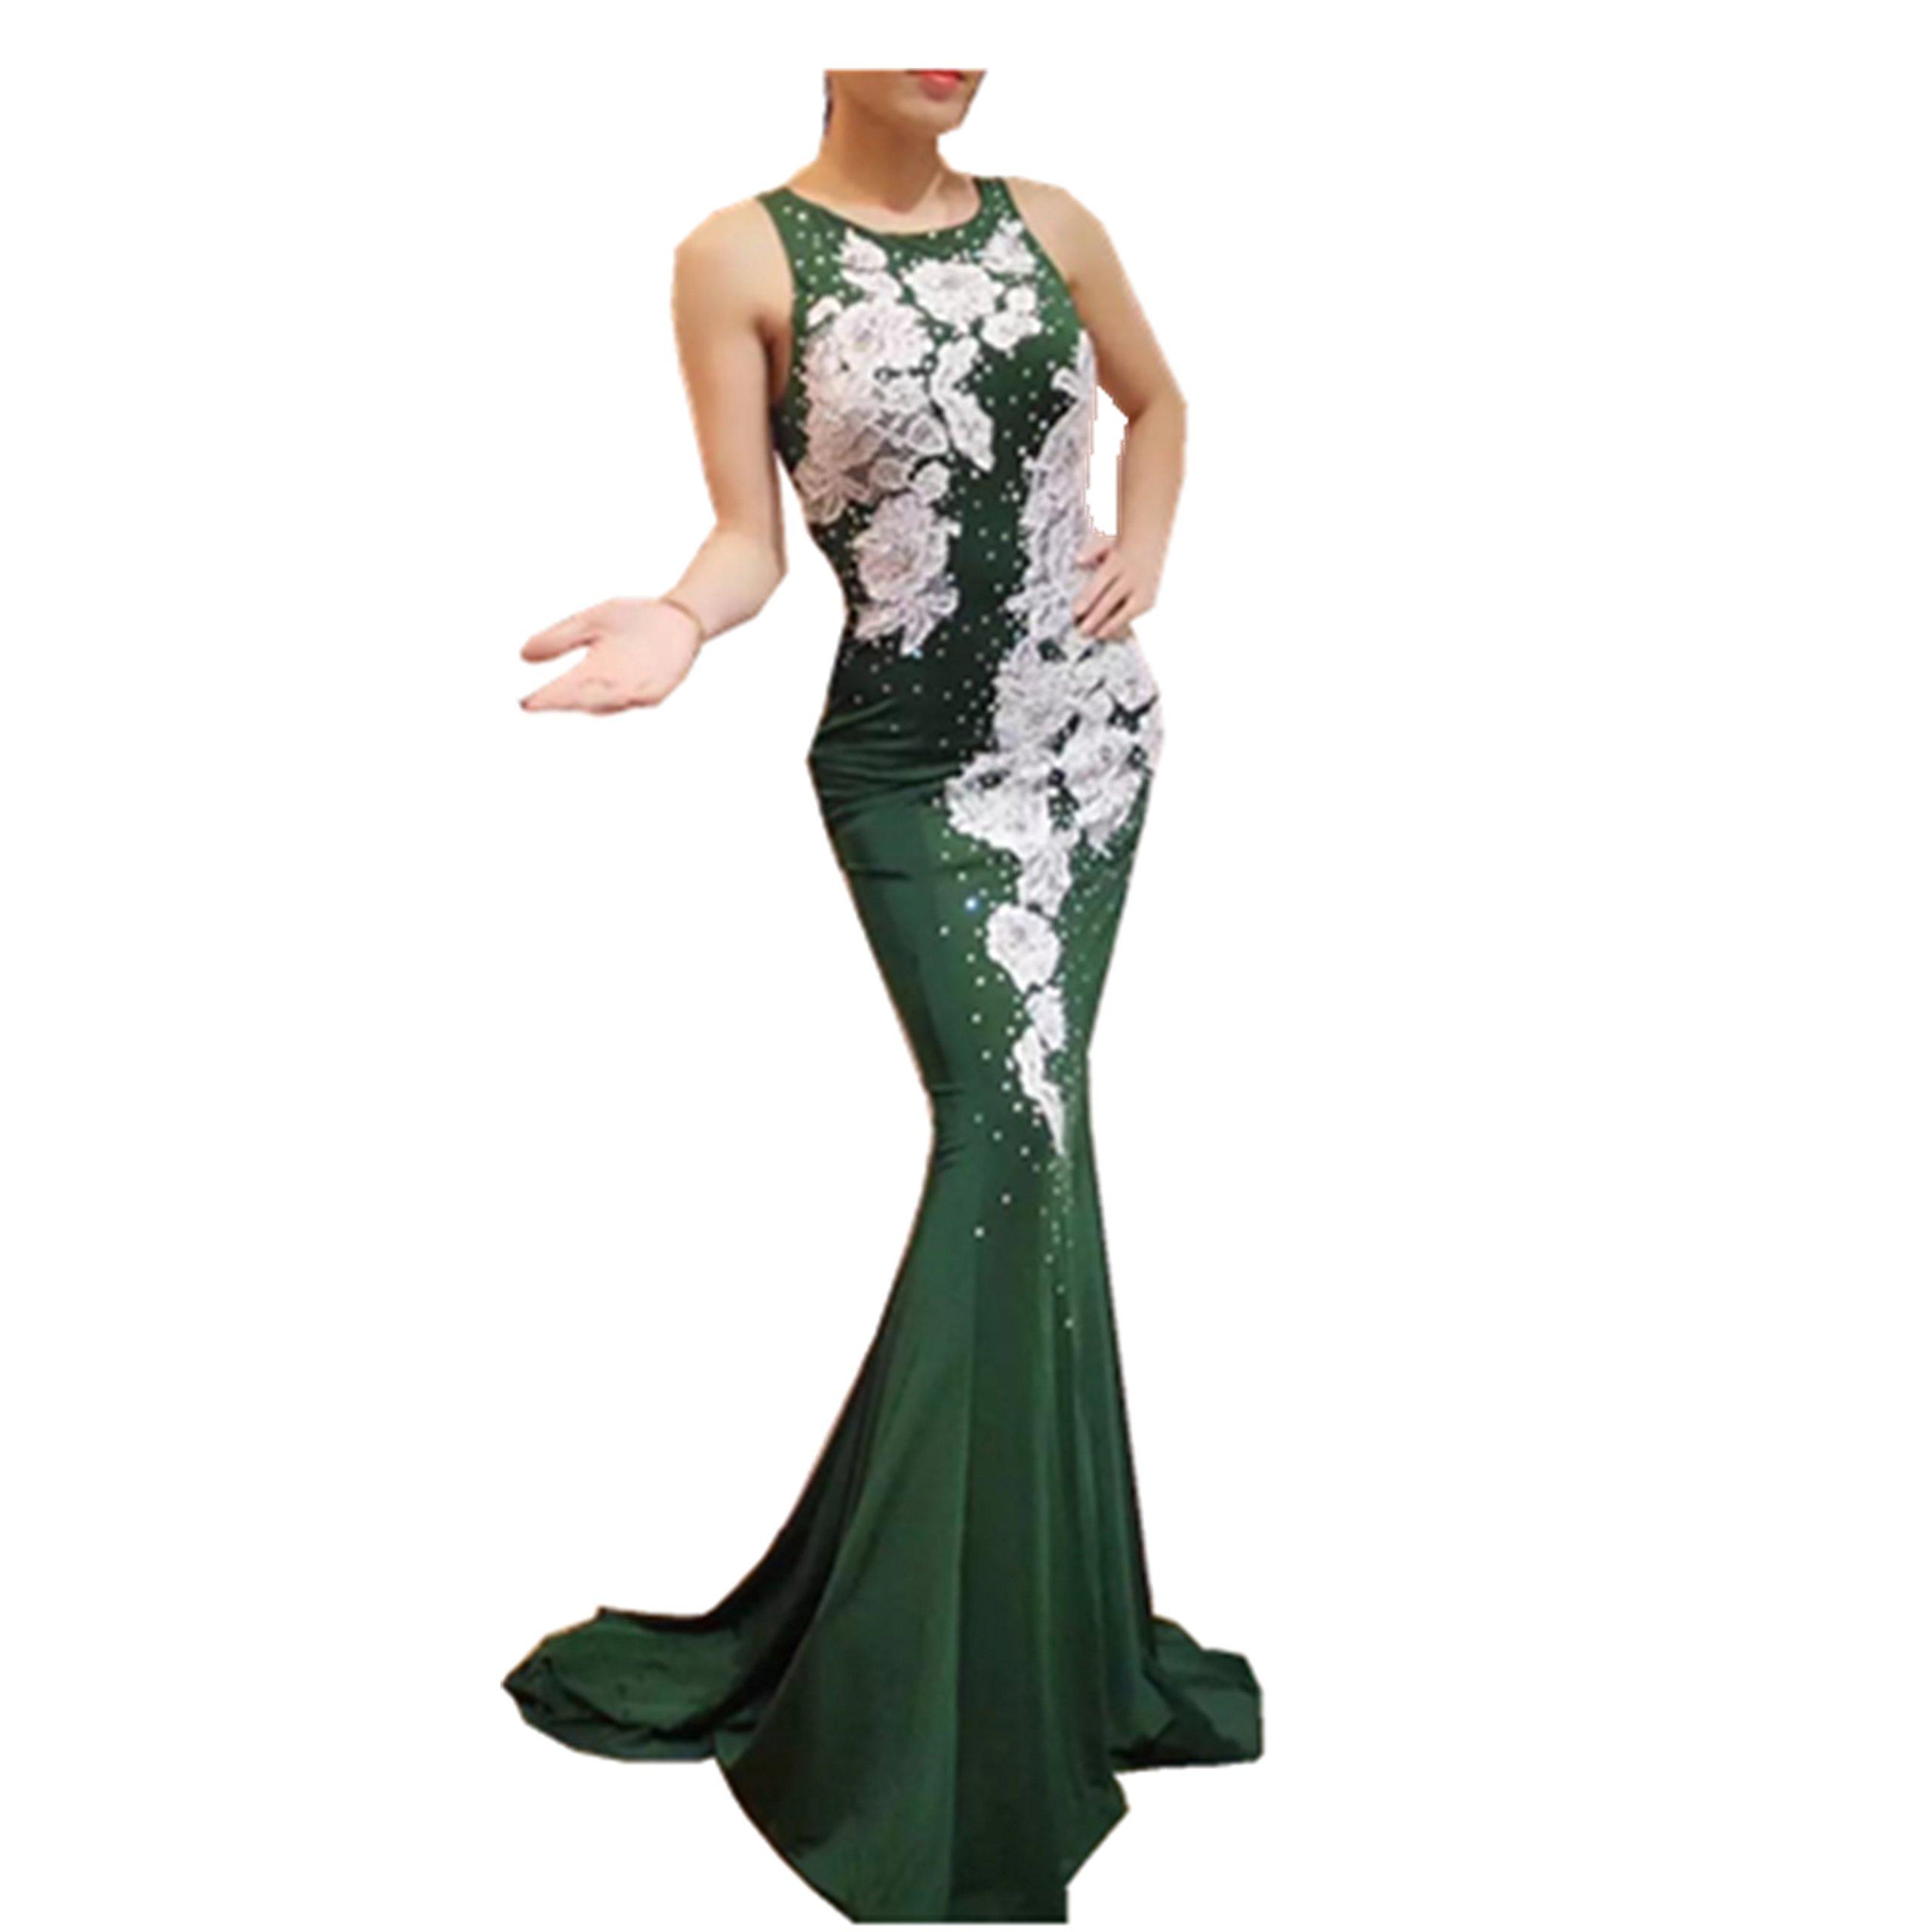 Gypsophila Women Fishtail Lace Beading Sleeveless Mermaid Evening Dress (4, Green) by Gypsophila